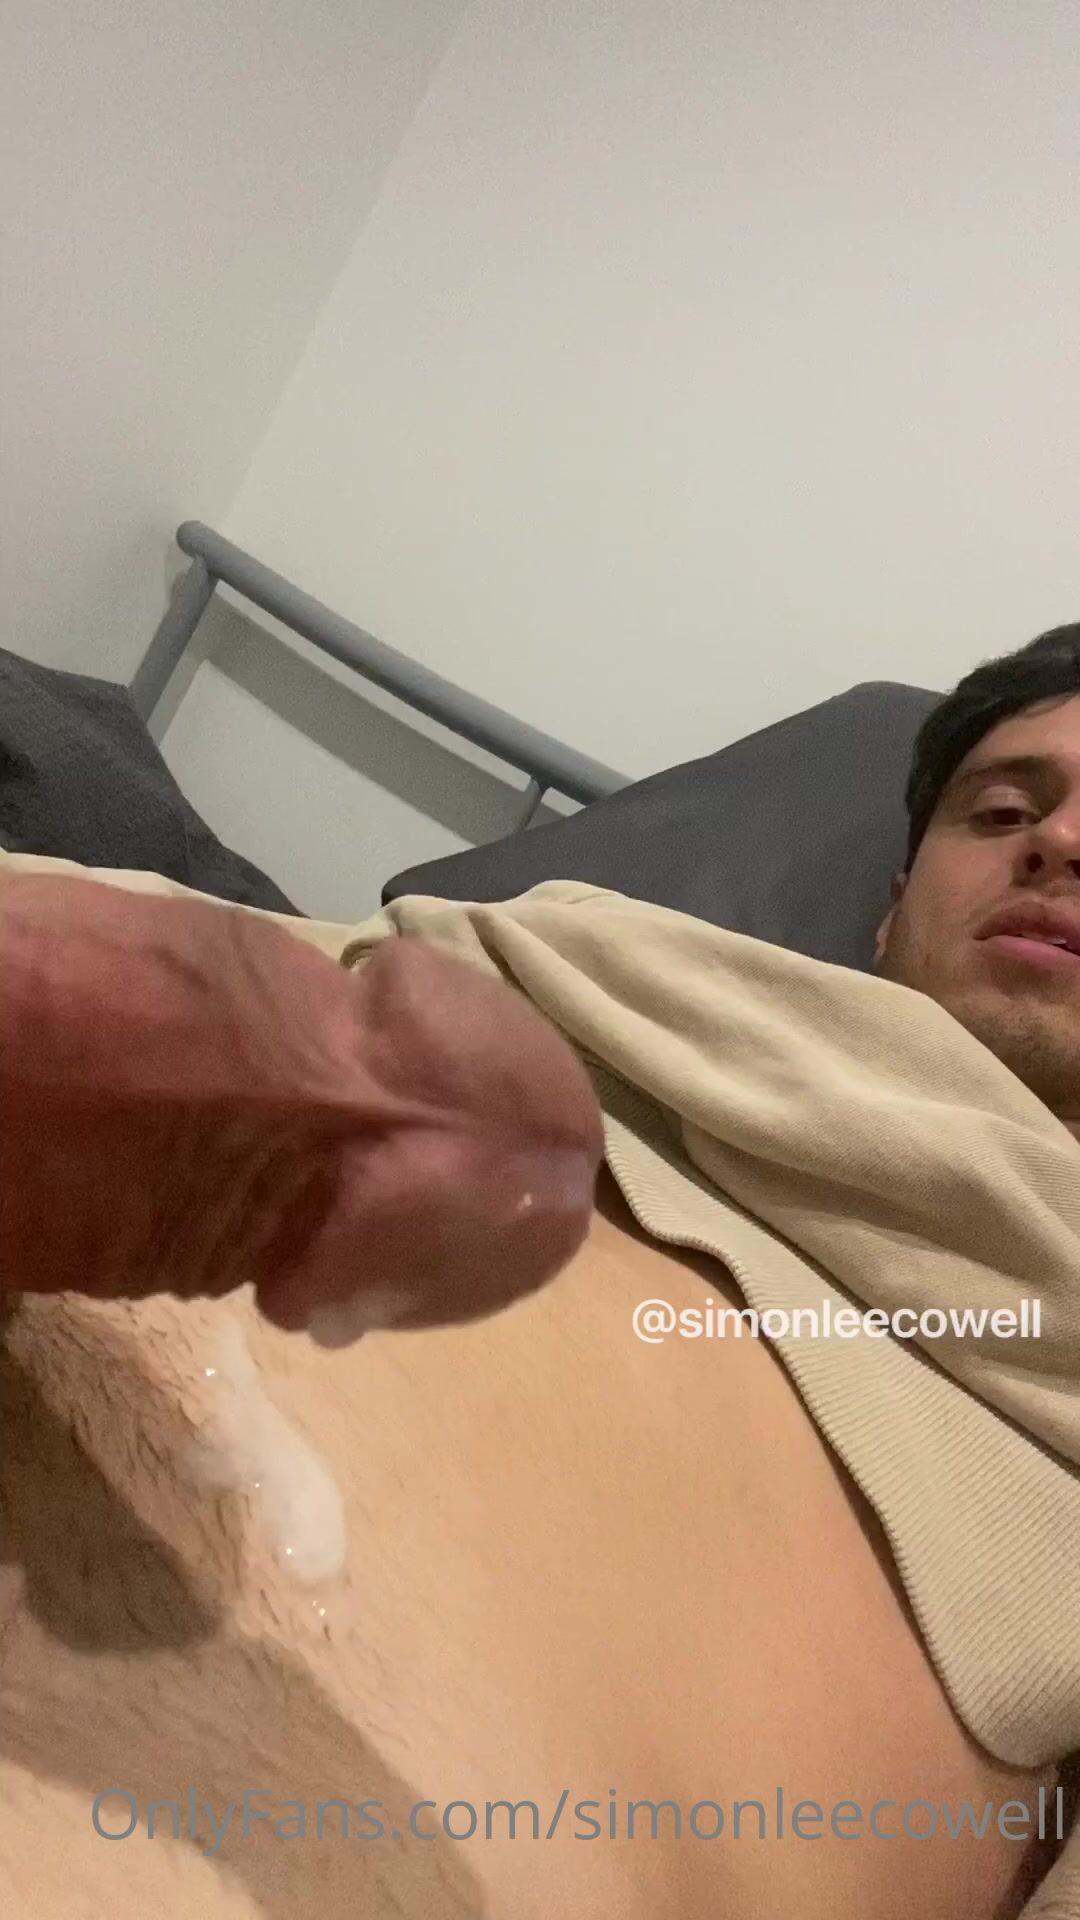 simonleecowell free porn video (42)